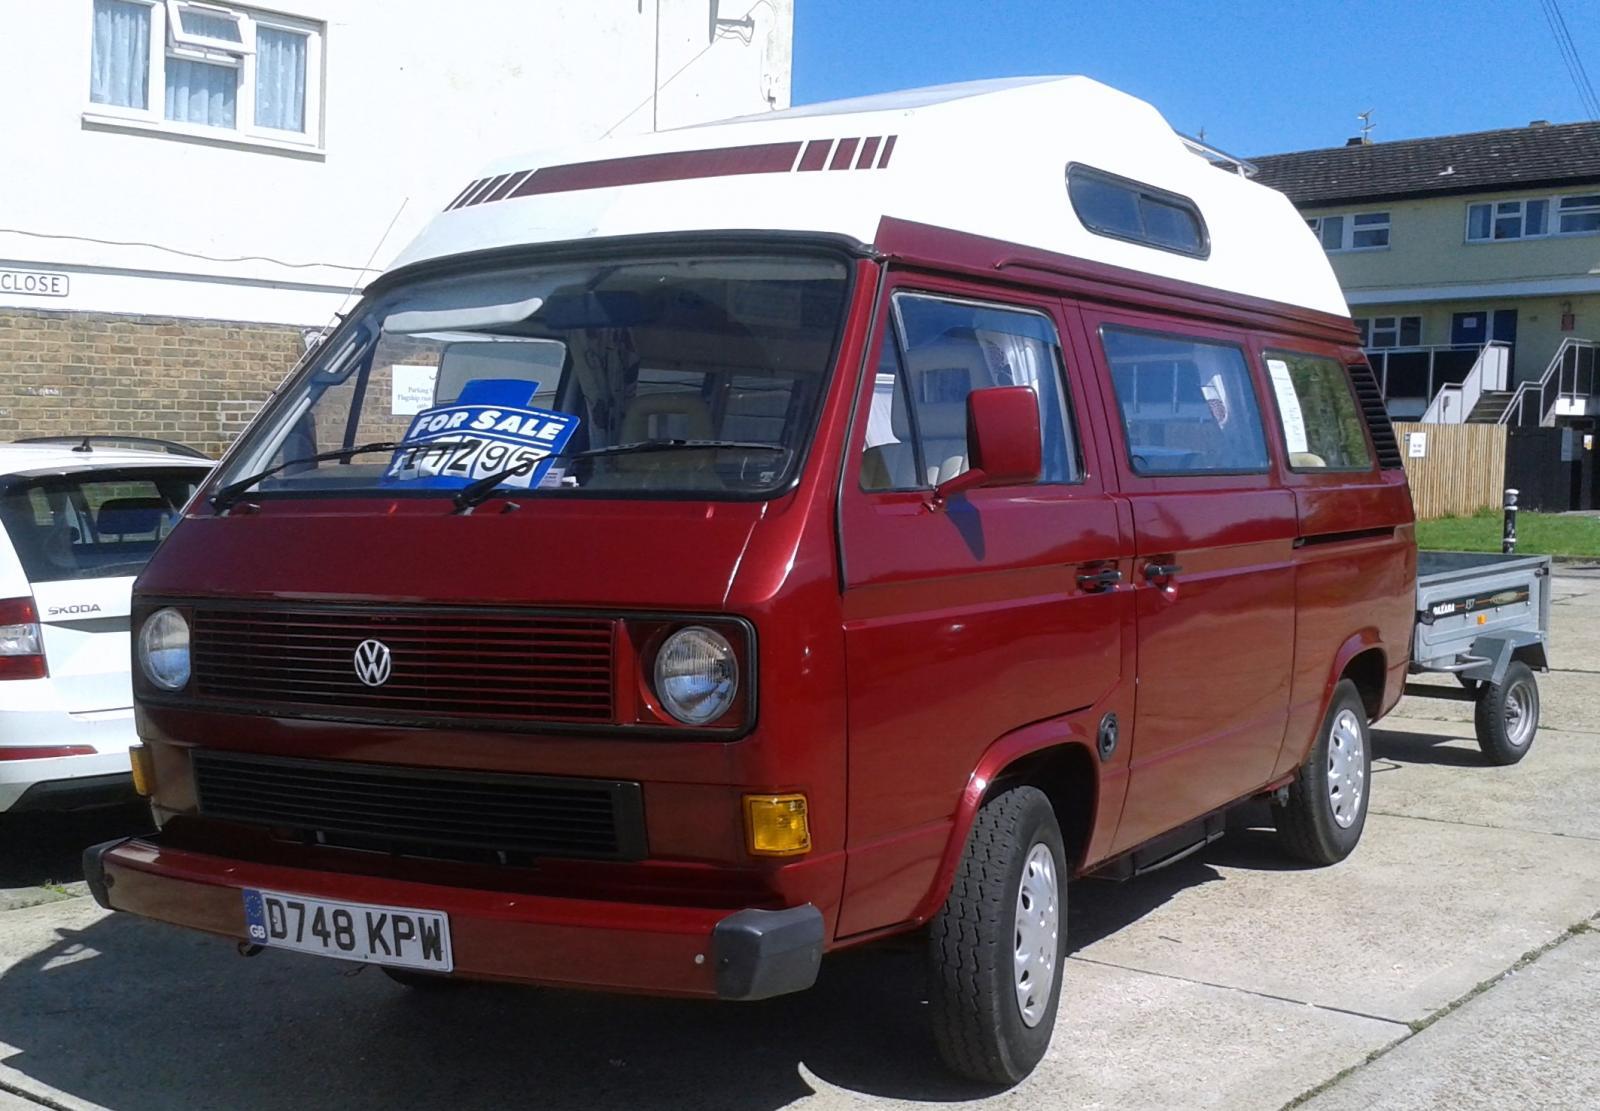 VW Camper D748KPW.jpg